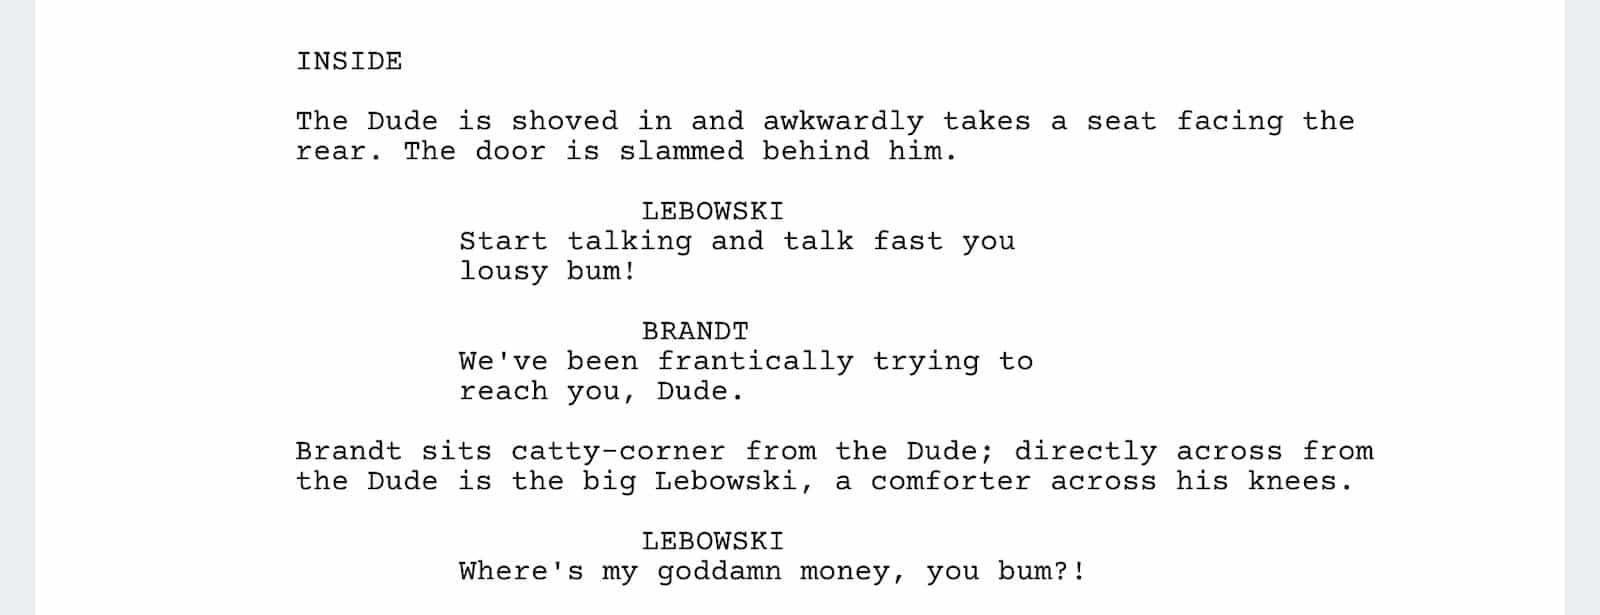 The Big Lebowski Script - Another Toe Scene - StudioBinder